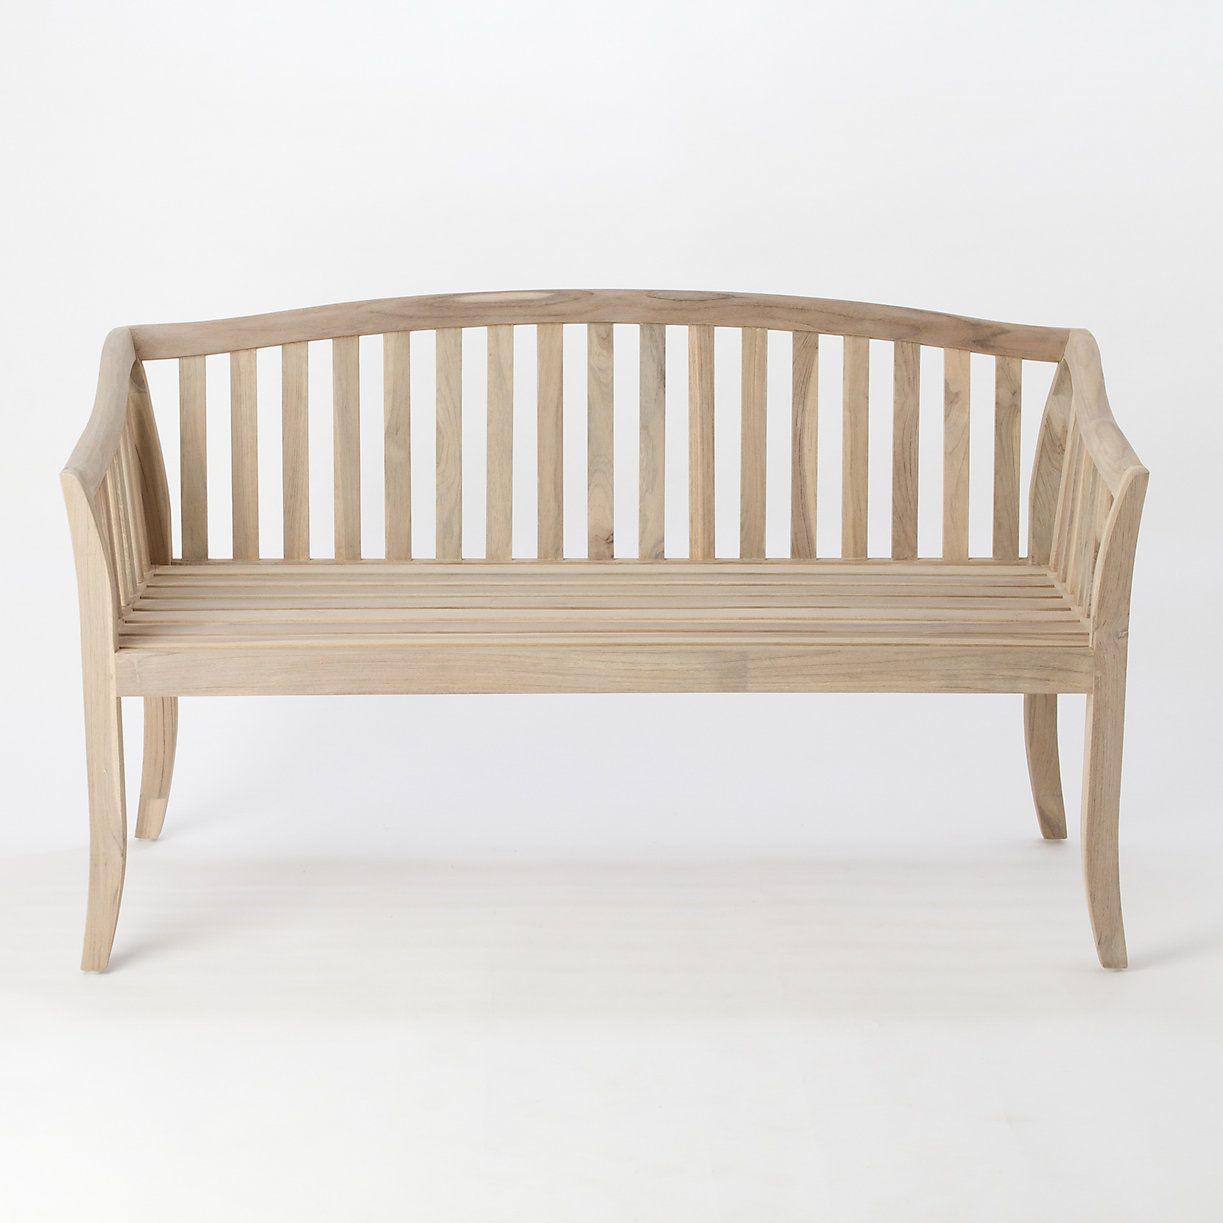 Terrain Preserved Teak Garden Bench #Shopterrain | Wooden For Hampstead Teak Garden Benches (View 24 of 25)